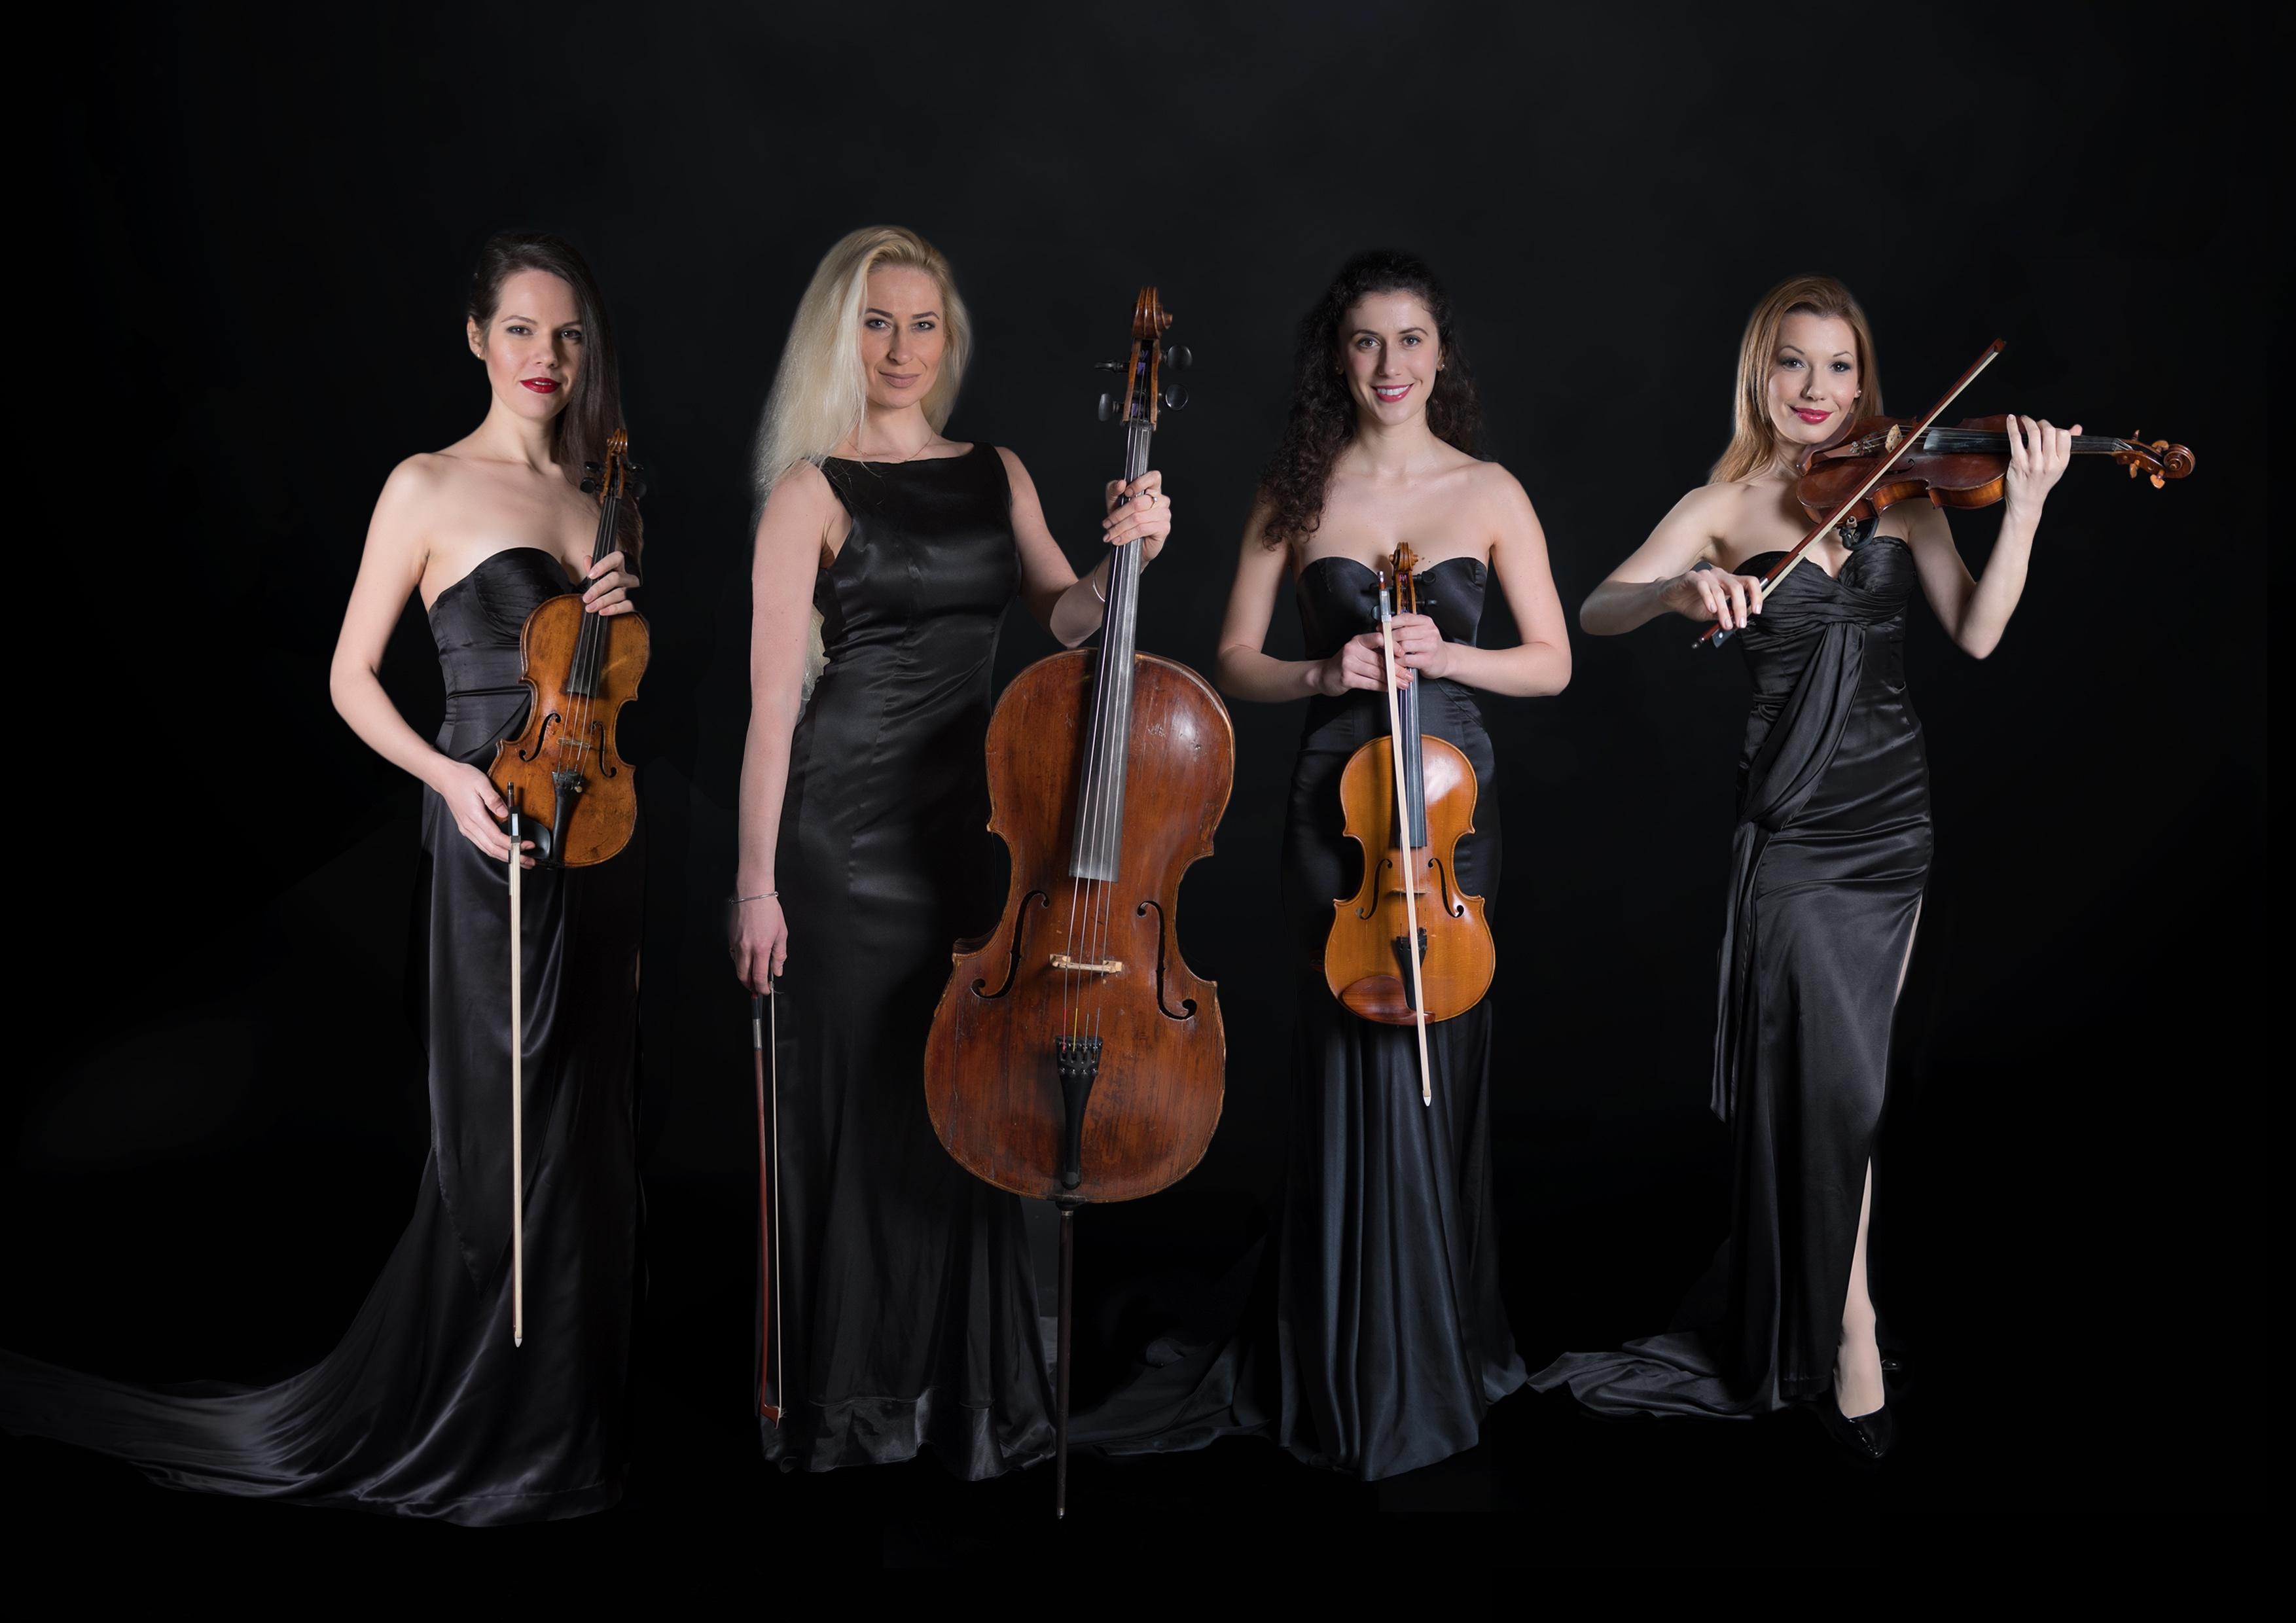 Meeting Offers Entertainment String Quartet